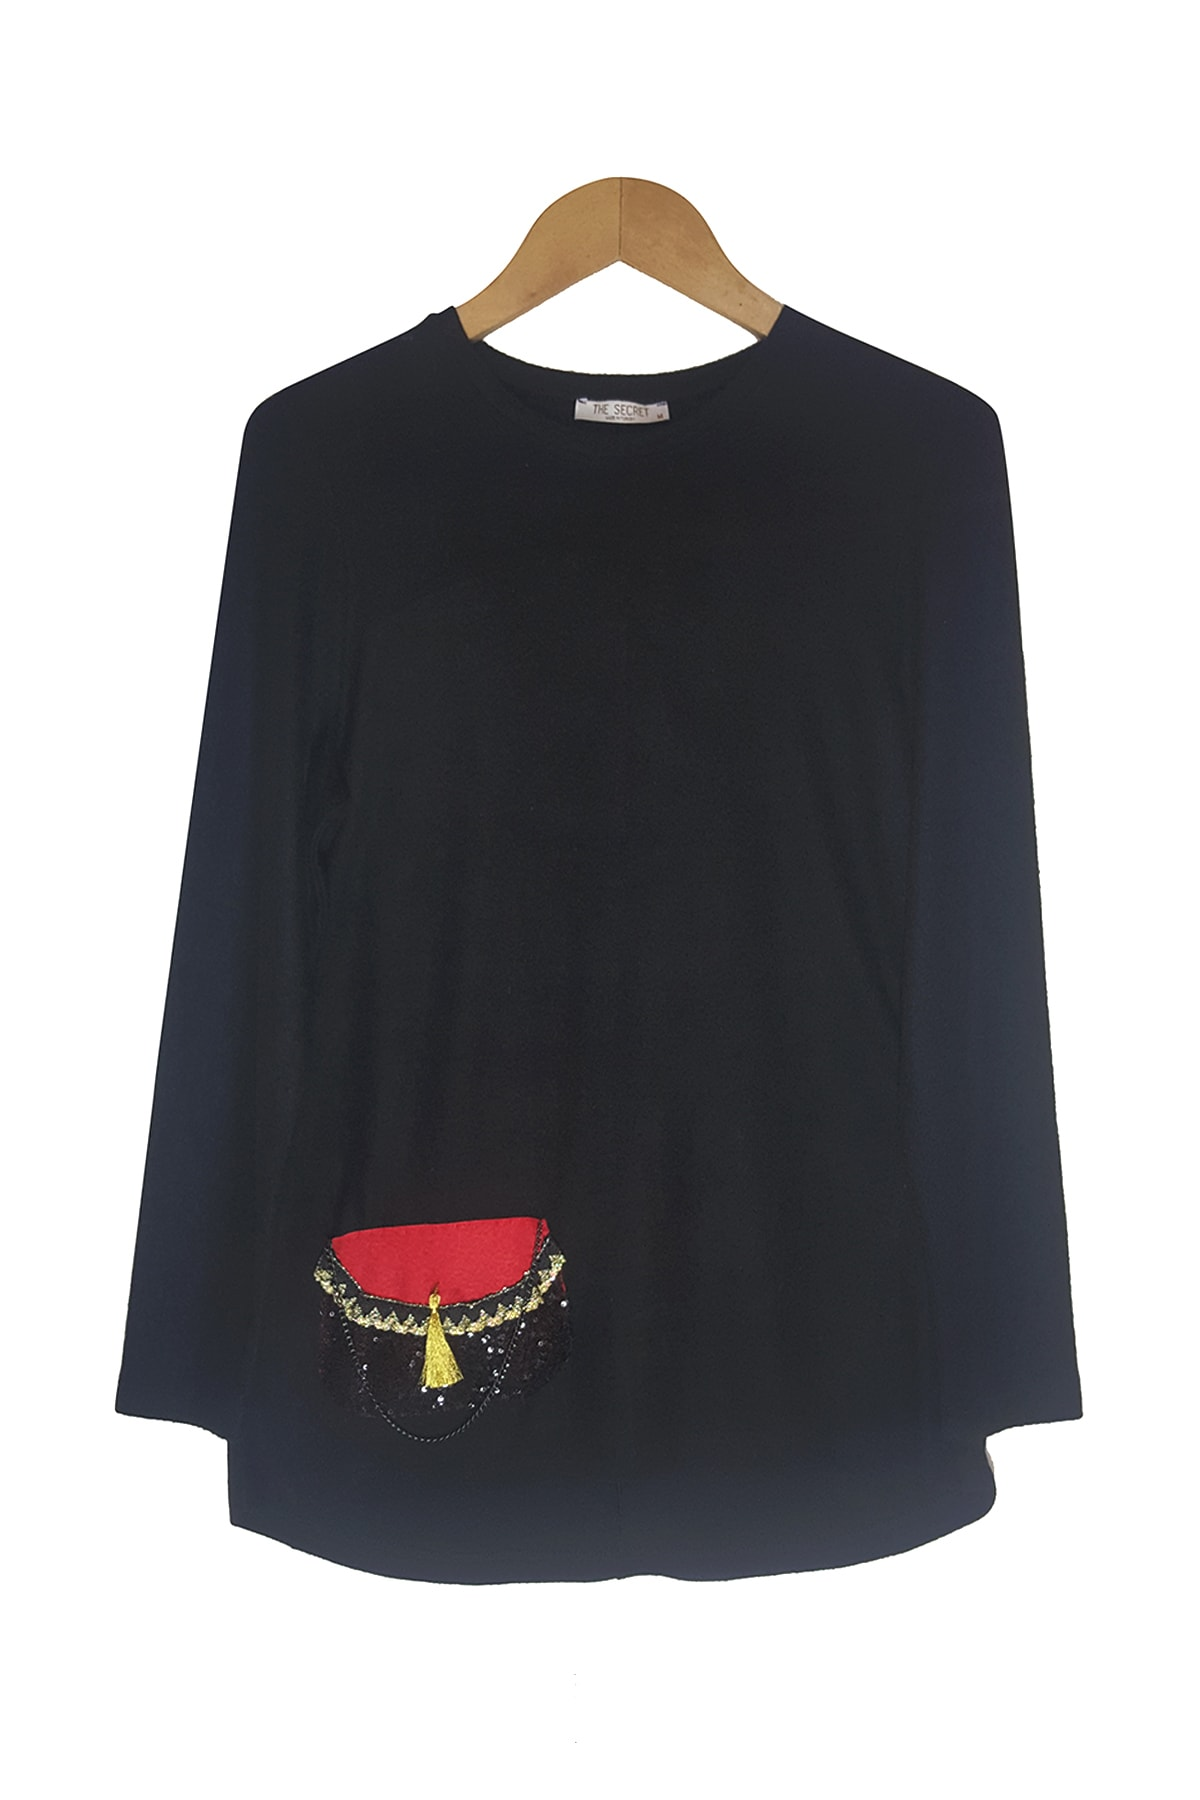 ZECİ COLLECTION Kadın Siyah Yumoş Kumaş Çanta Tasarımlı Triko 1